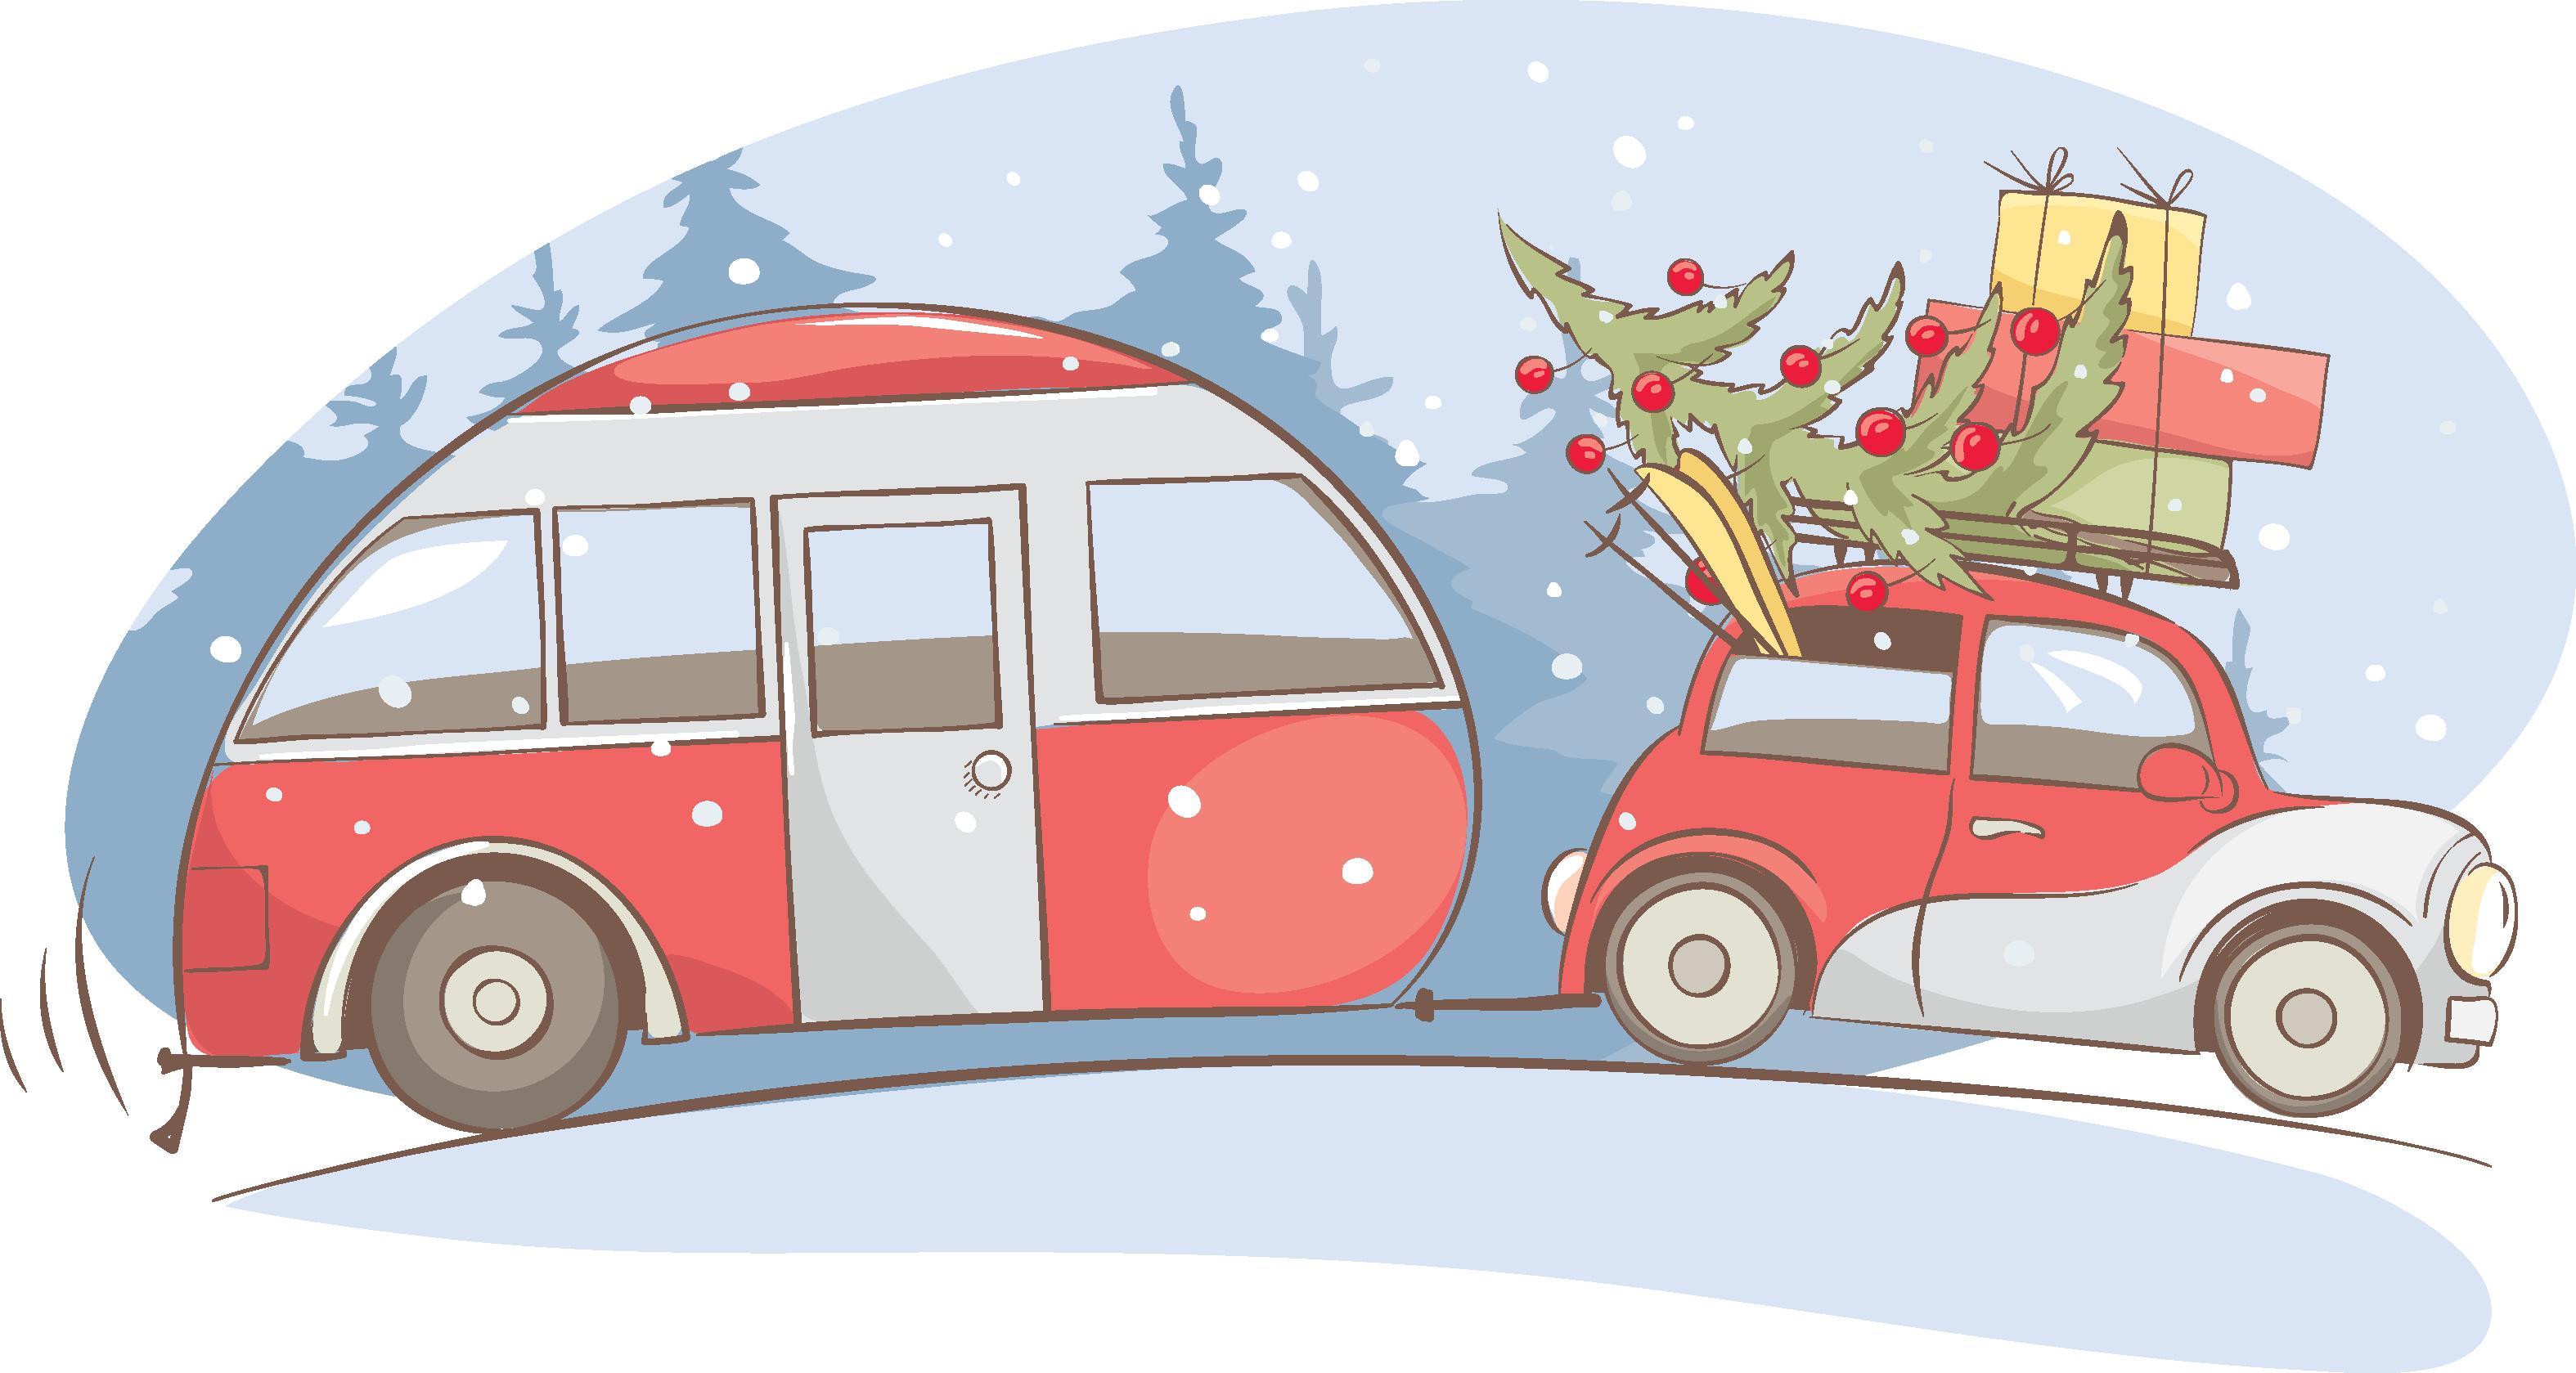 dac83da6-tree-and-van